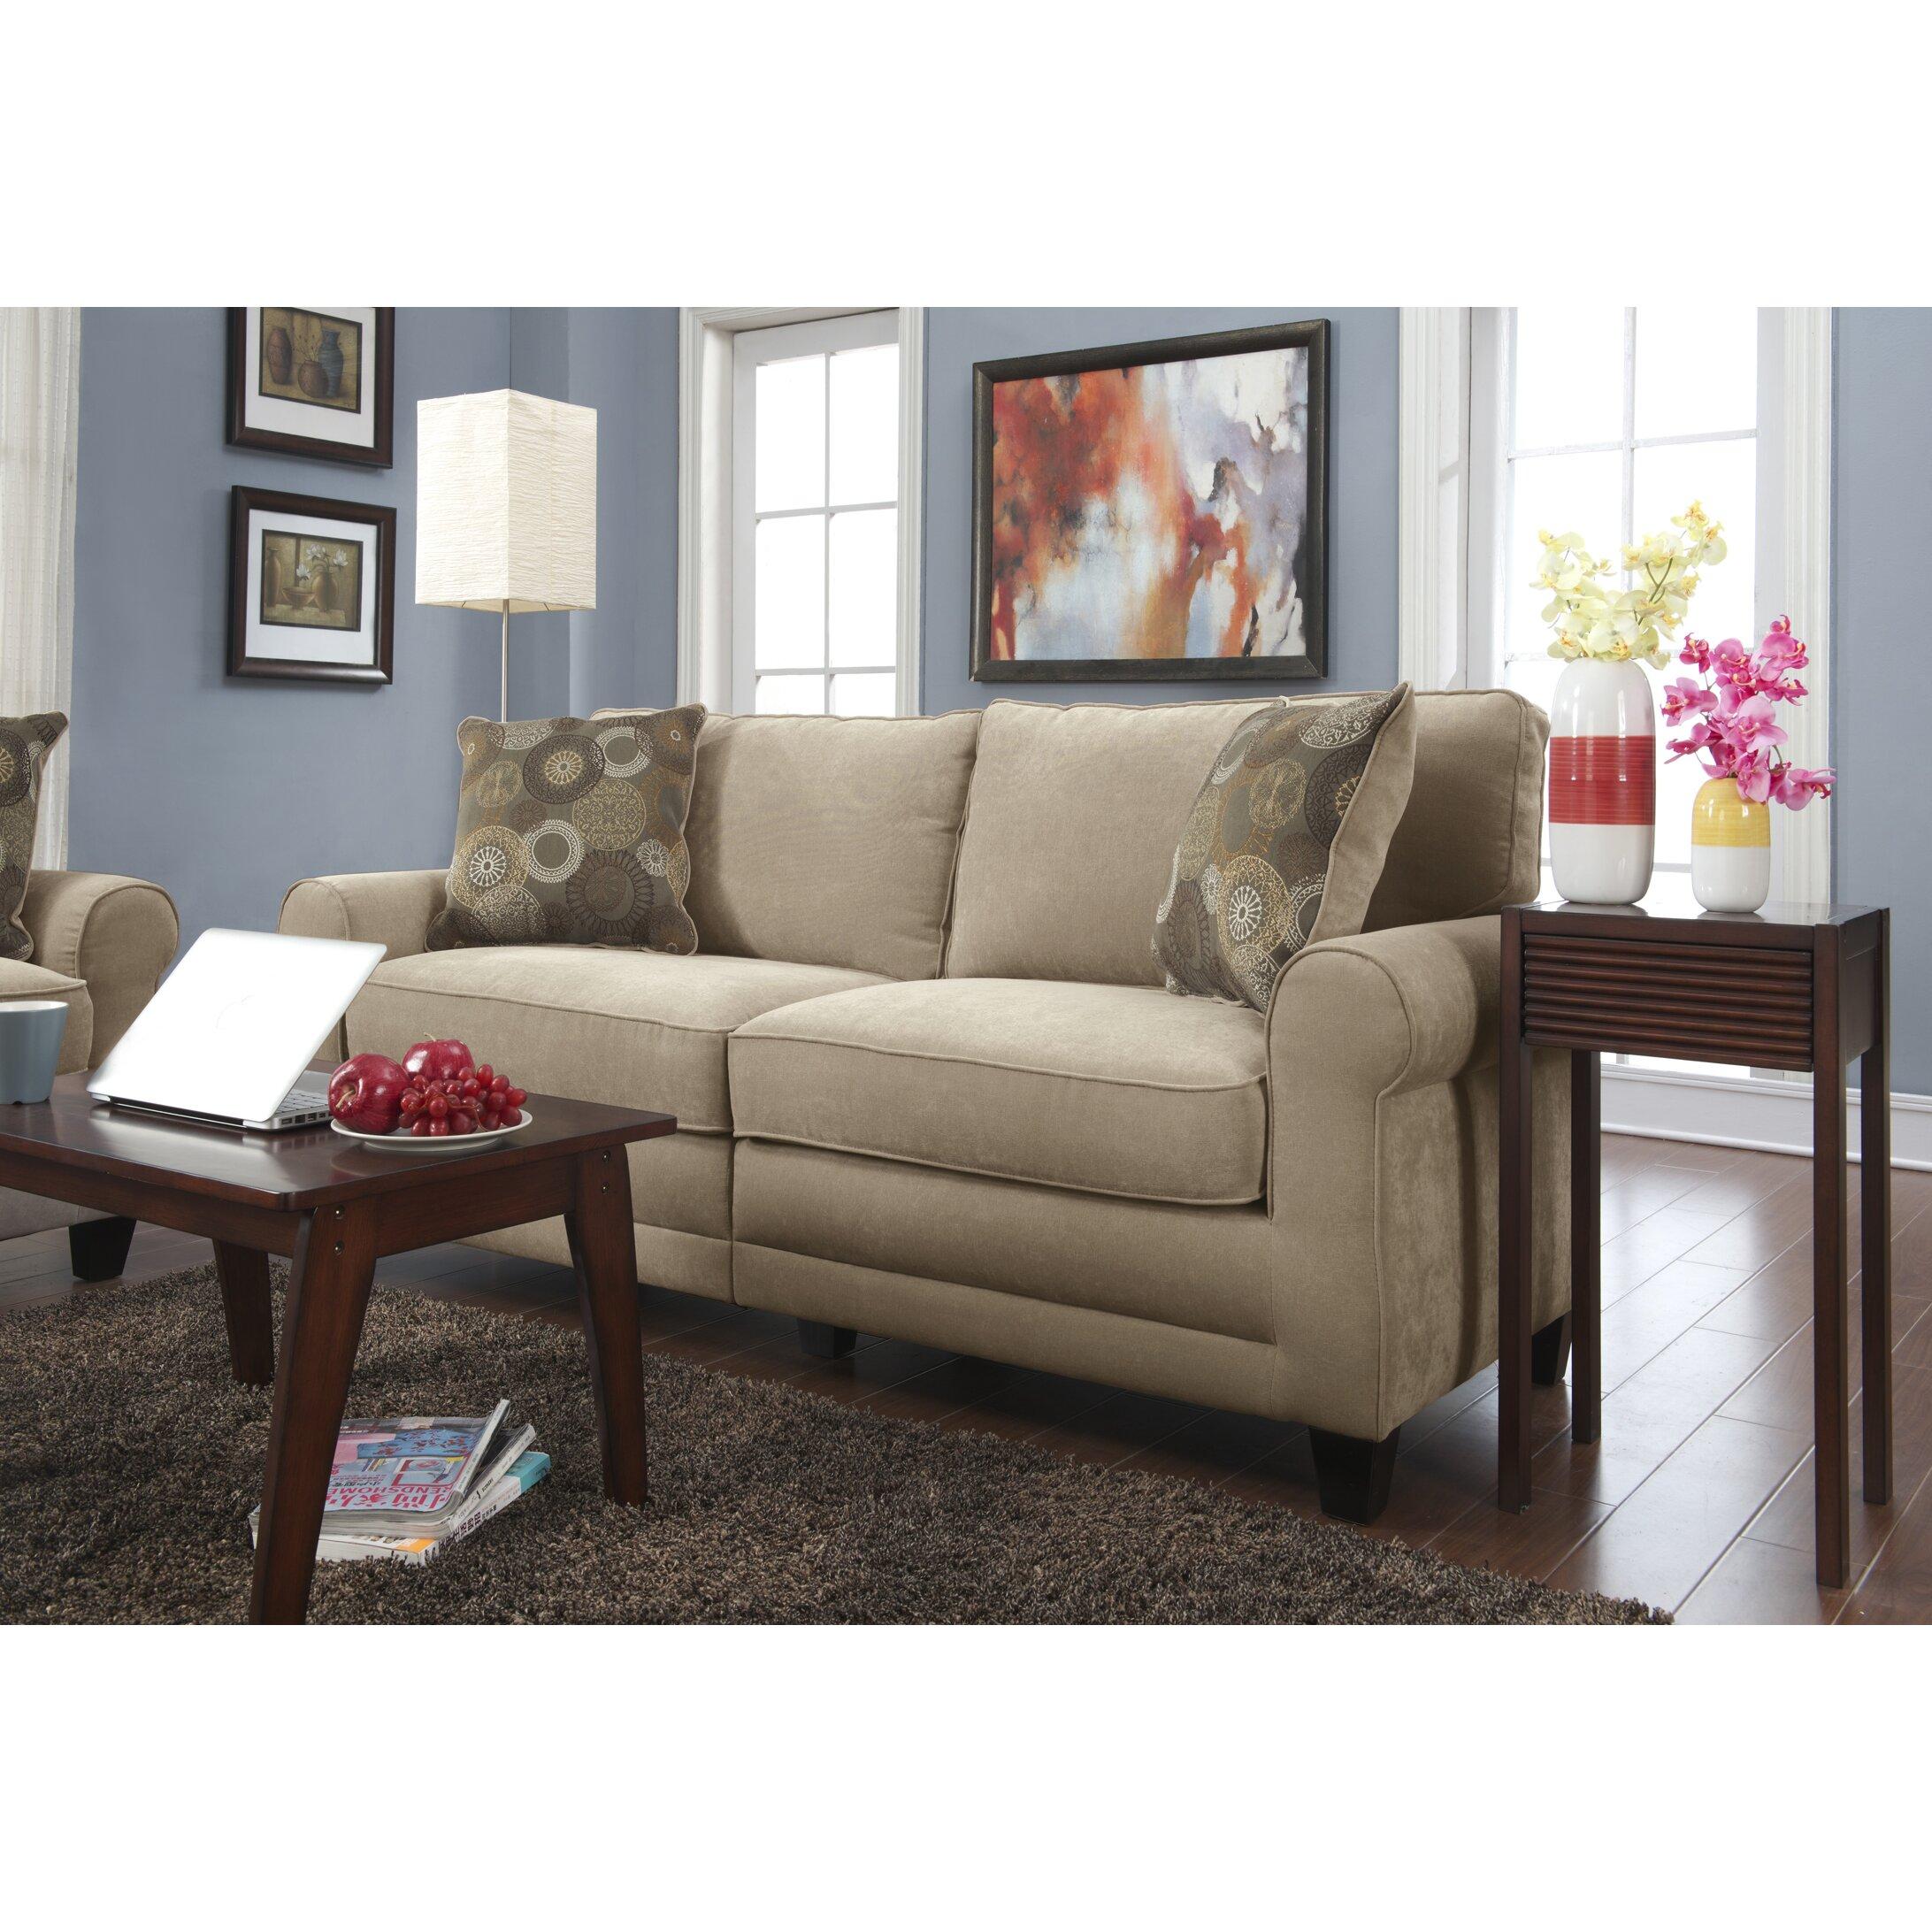 Serta at home copenhagen sofa